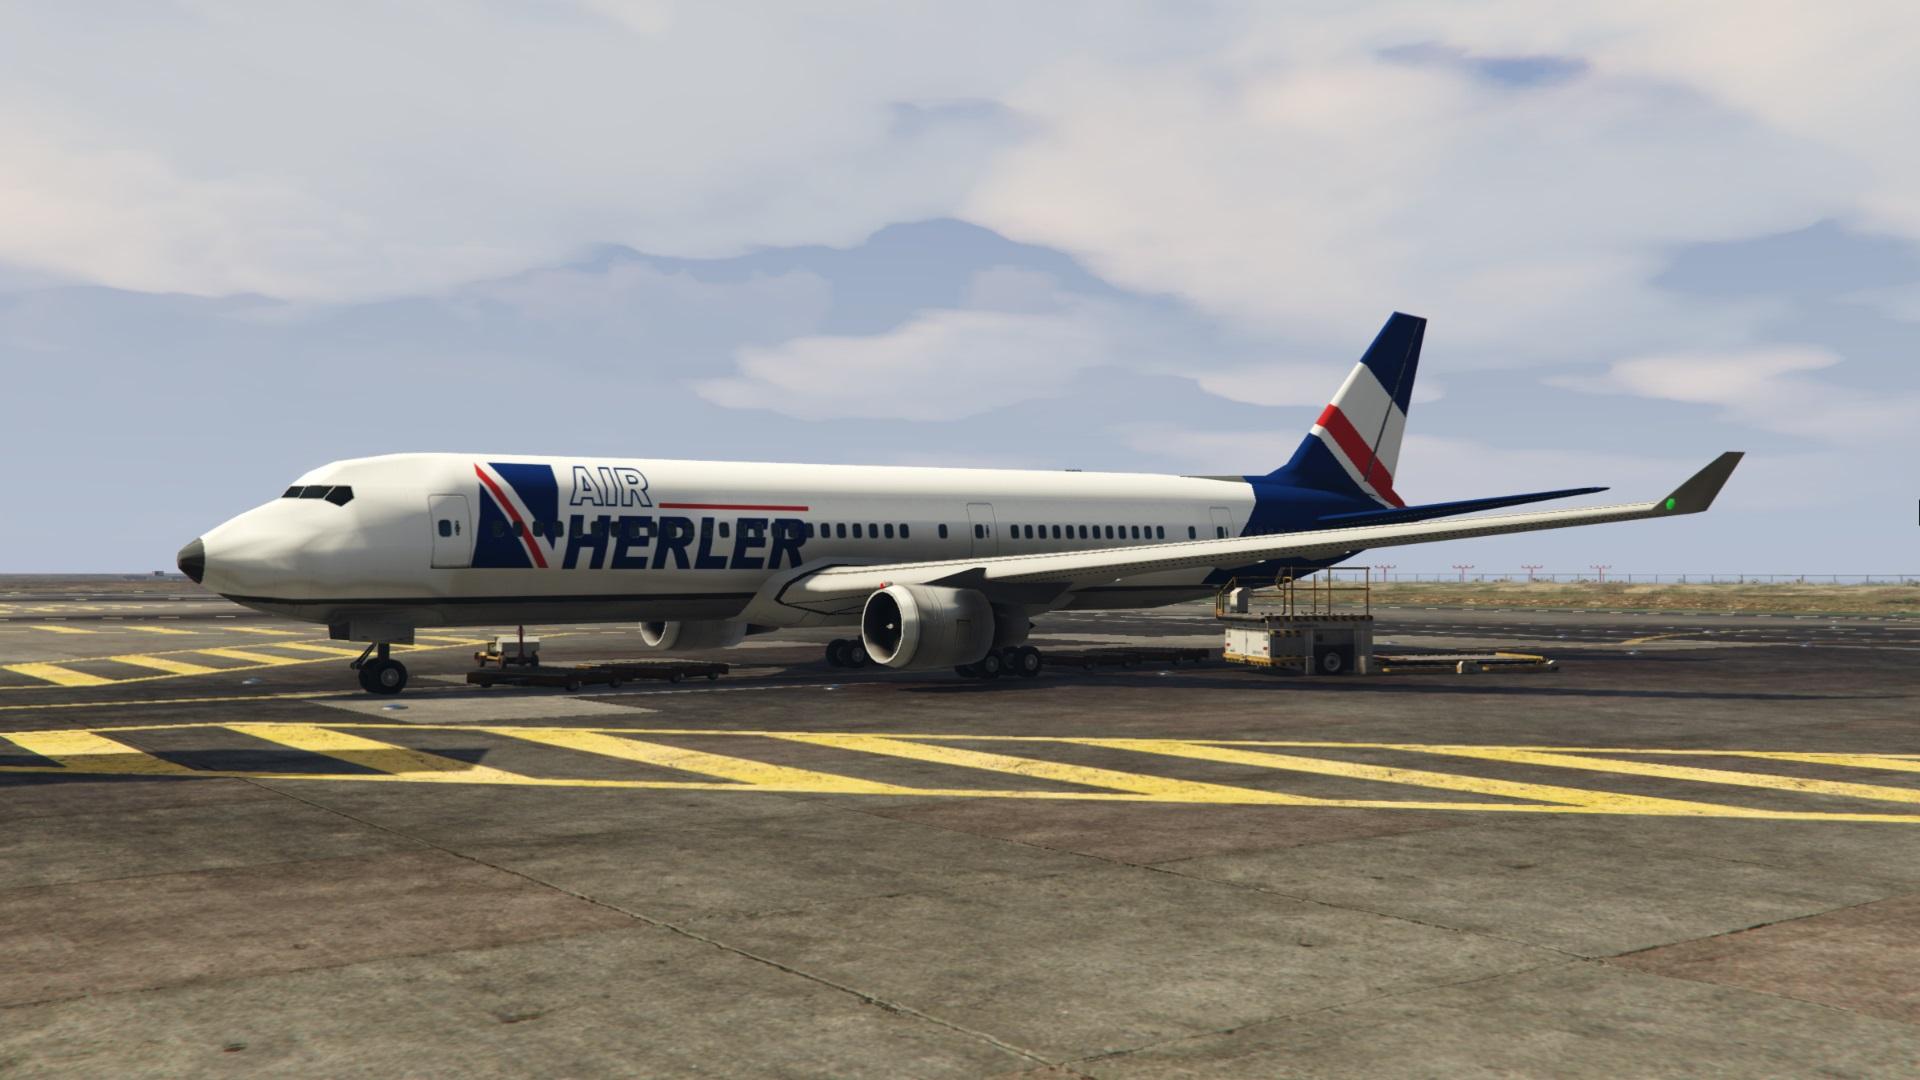 Archivo:Air Herler Plane.jpg